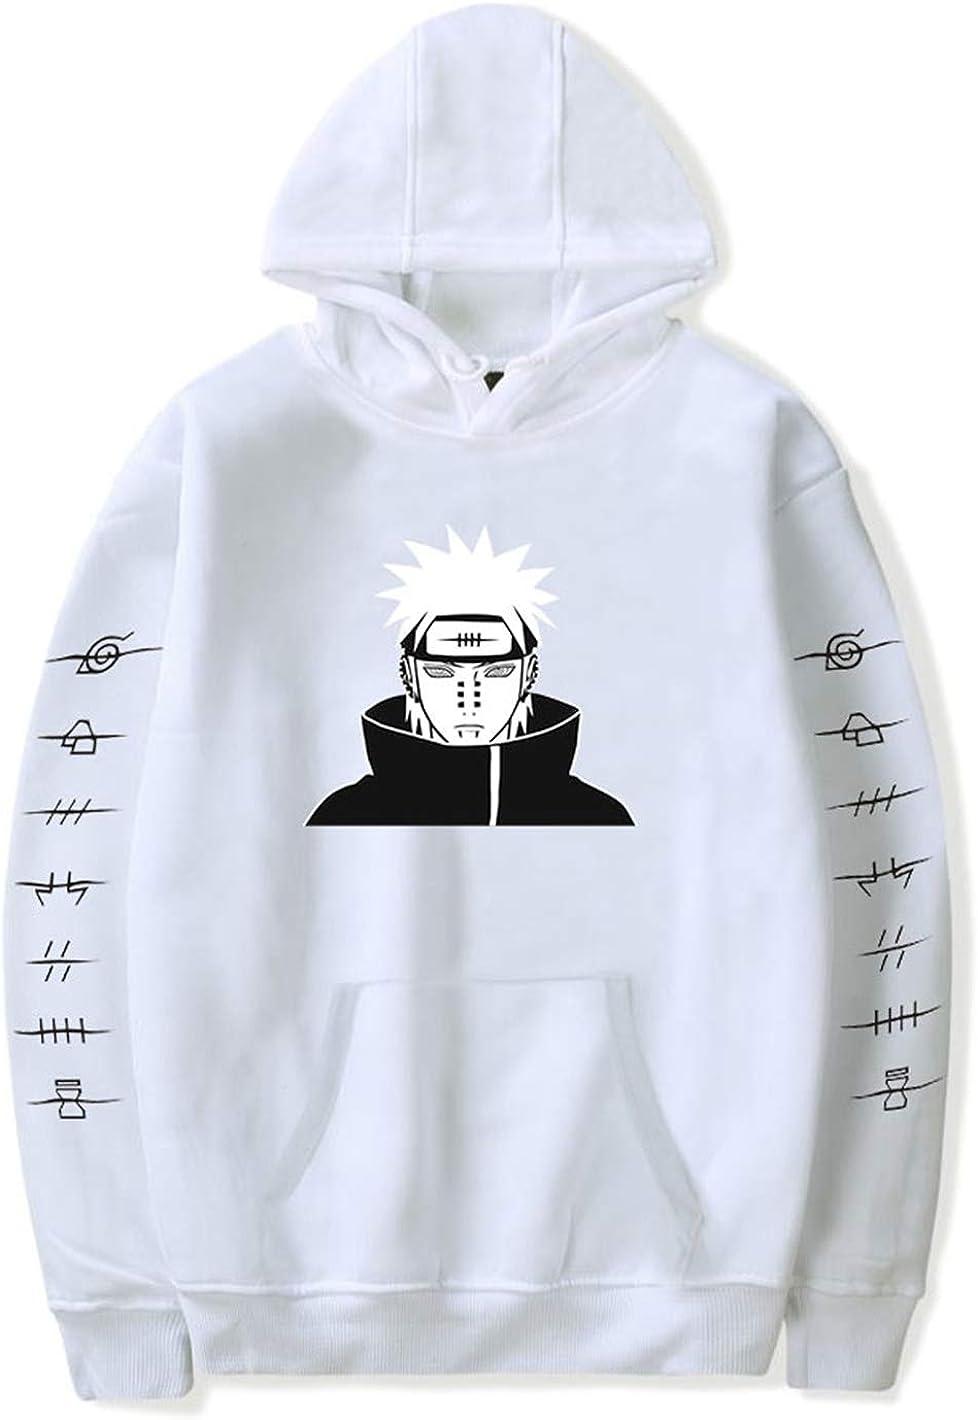 Japanese Anime Naruto Sweats /à Capuche Itachi Akatsuki Coton Pullover Streetswear Sweatshirts Cosplay